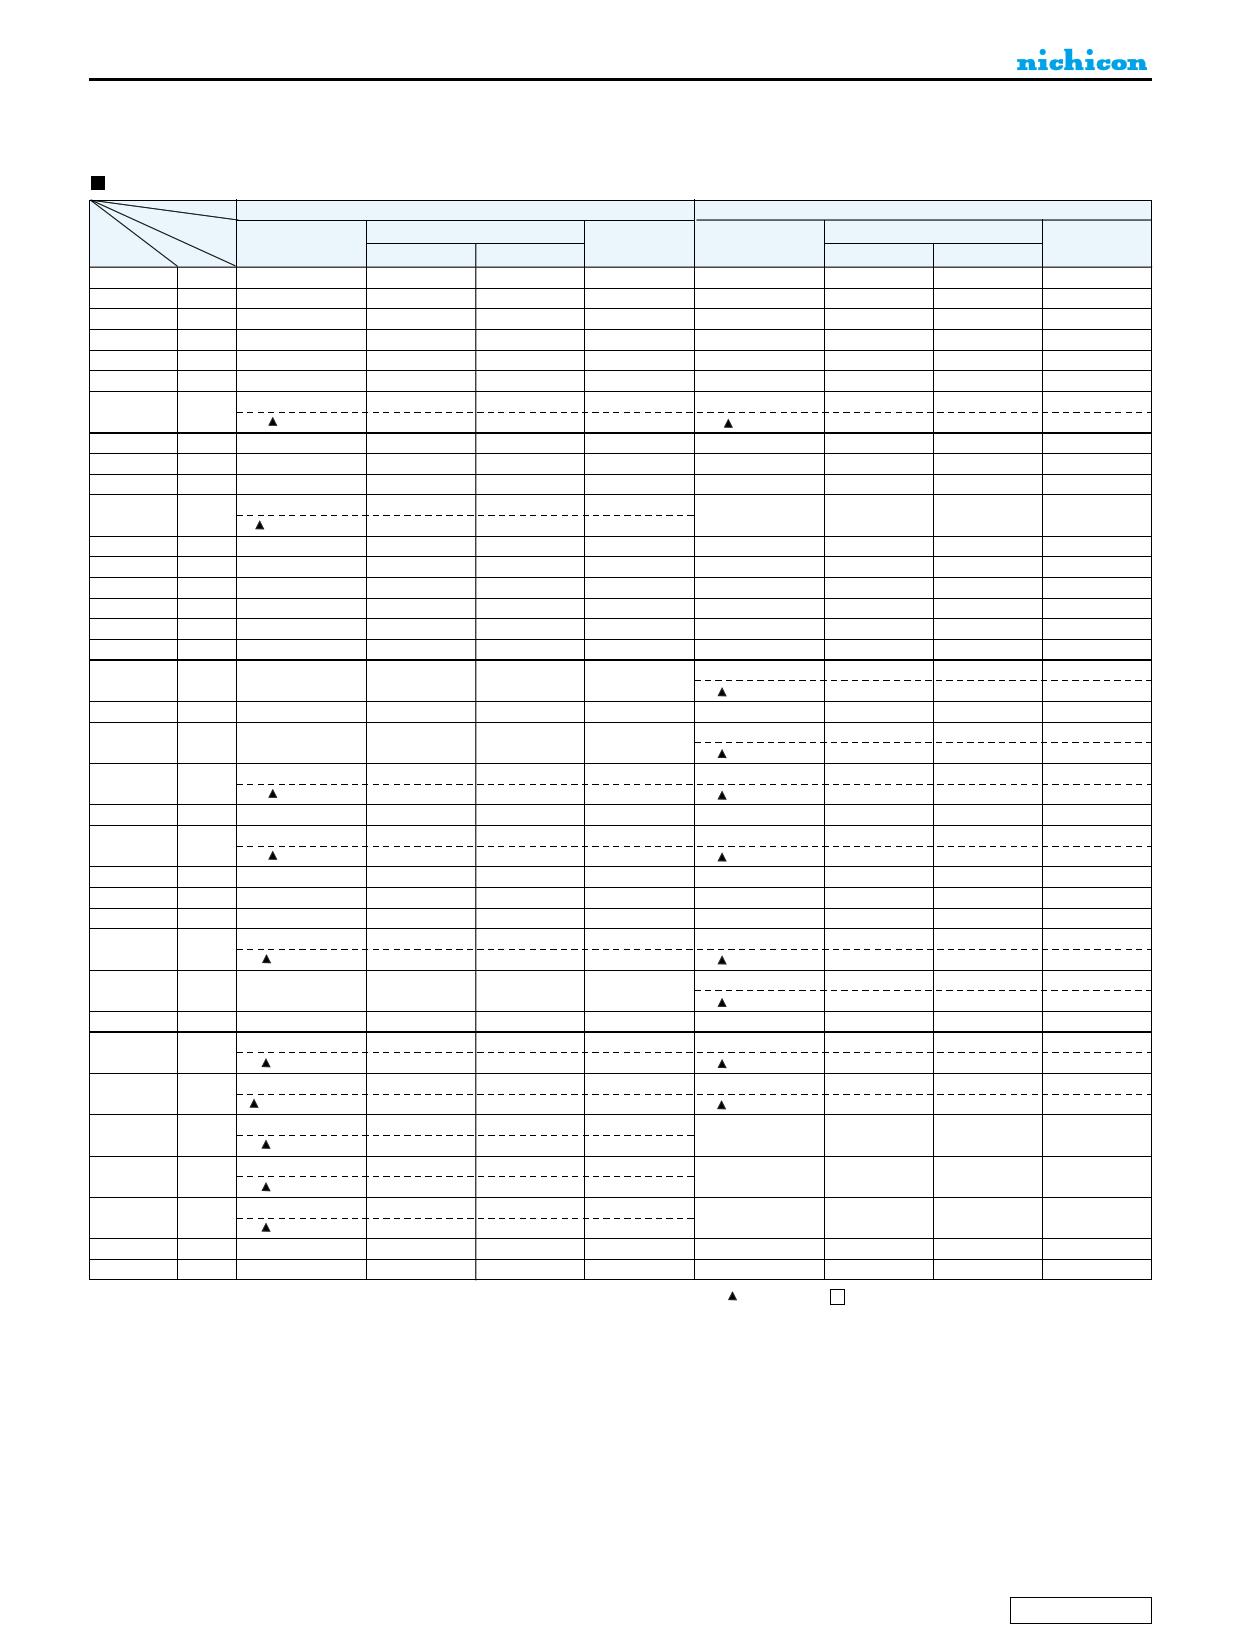 UPW1V222MHD pdf, 반도체, 판매, 대치품